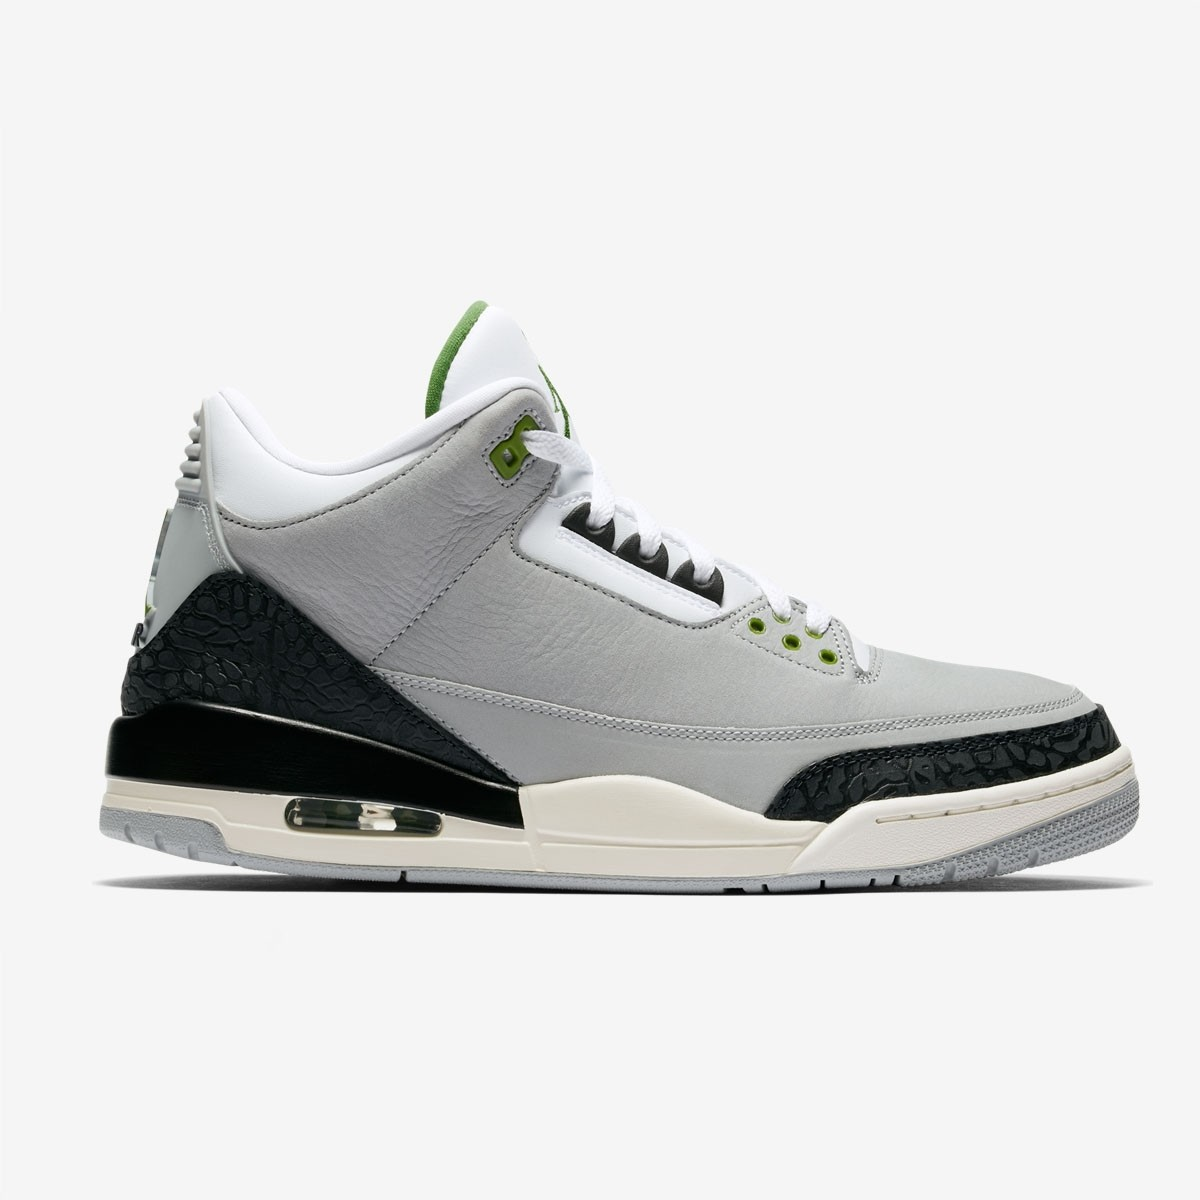 Air Jordan 3 Tinker 'Chlorophyll'